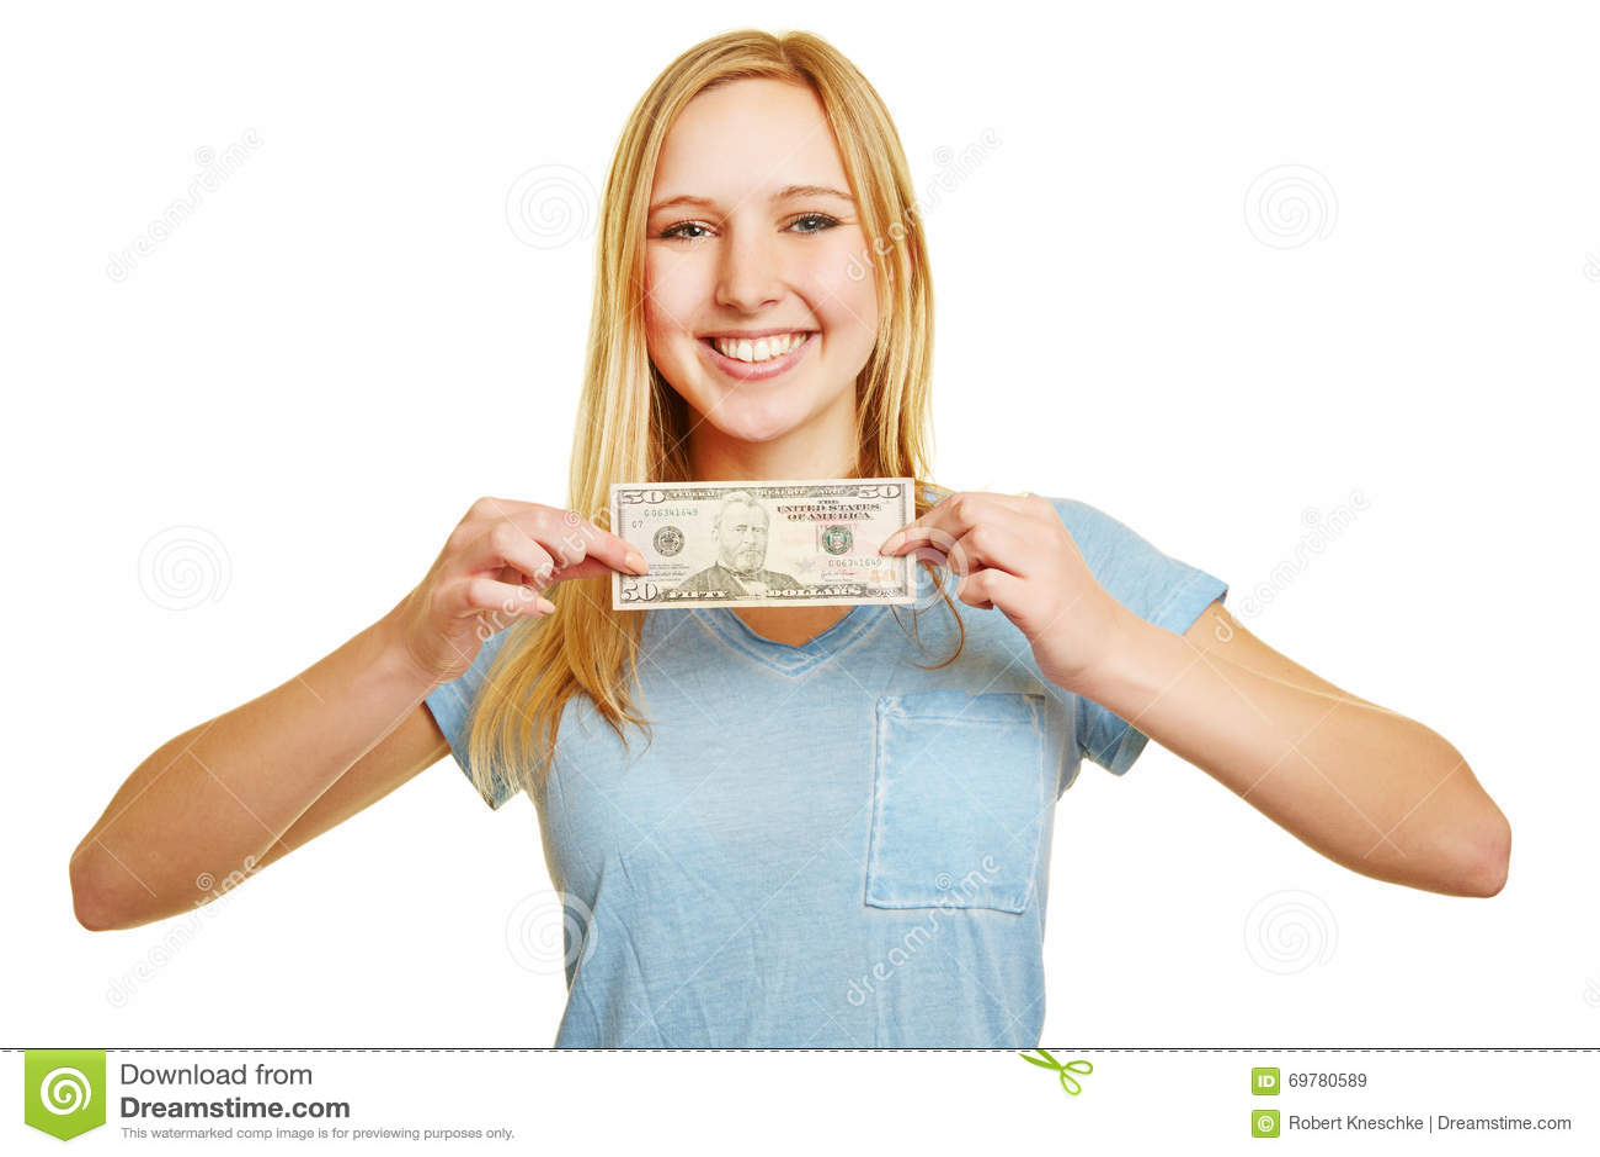 Happy woman holding 50 dollar bill